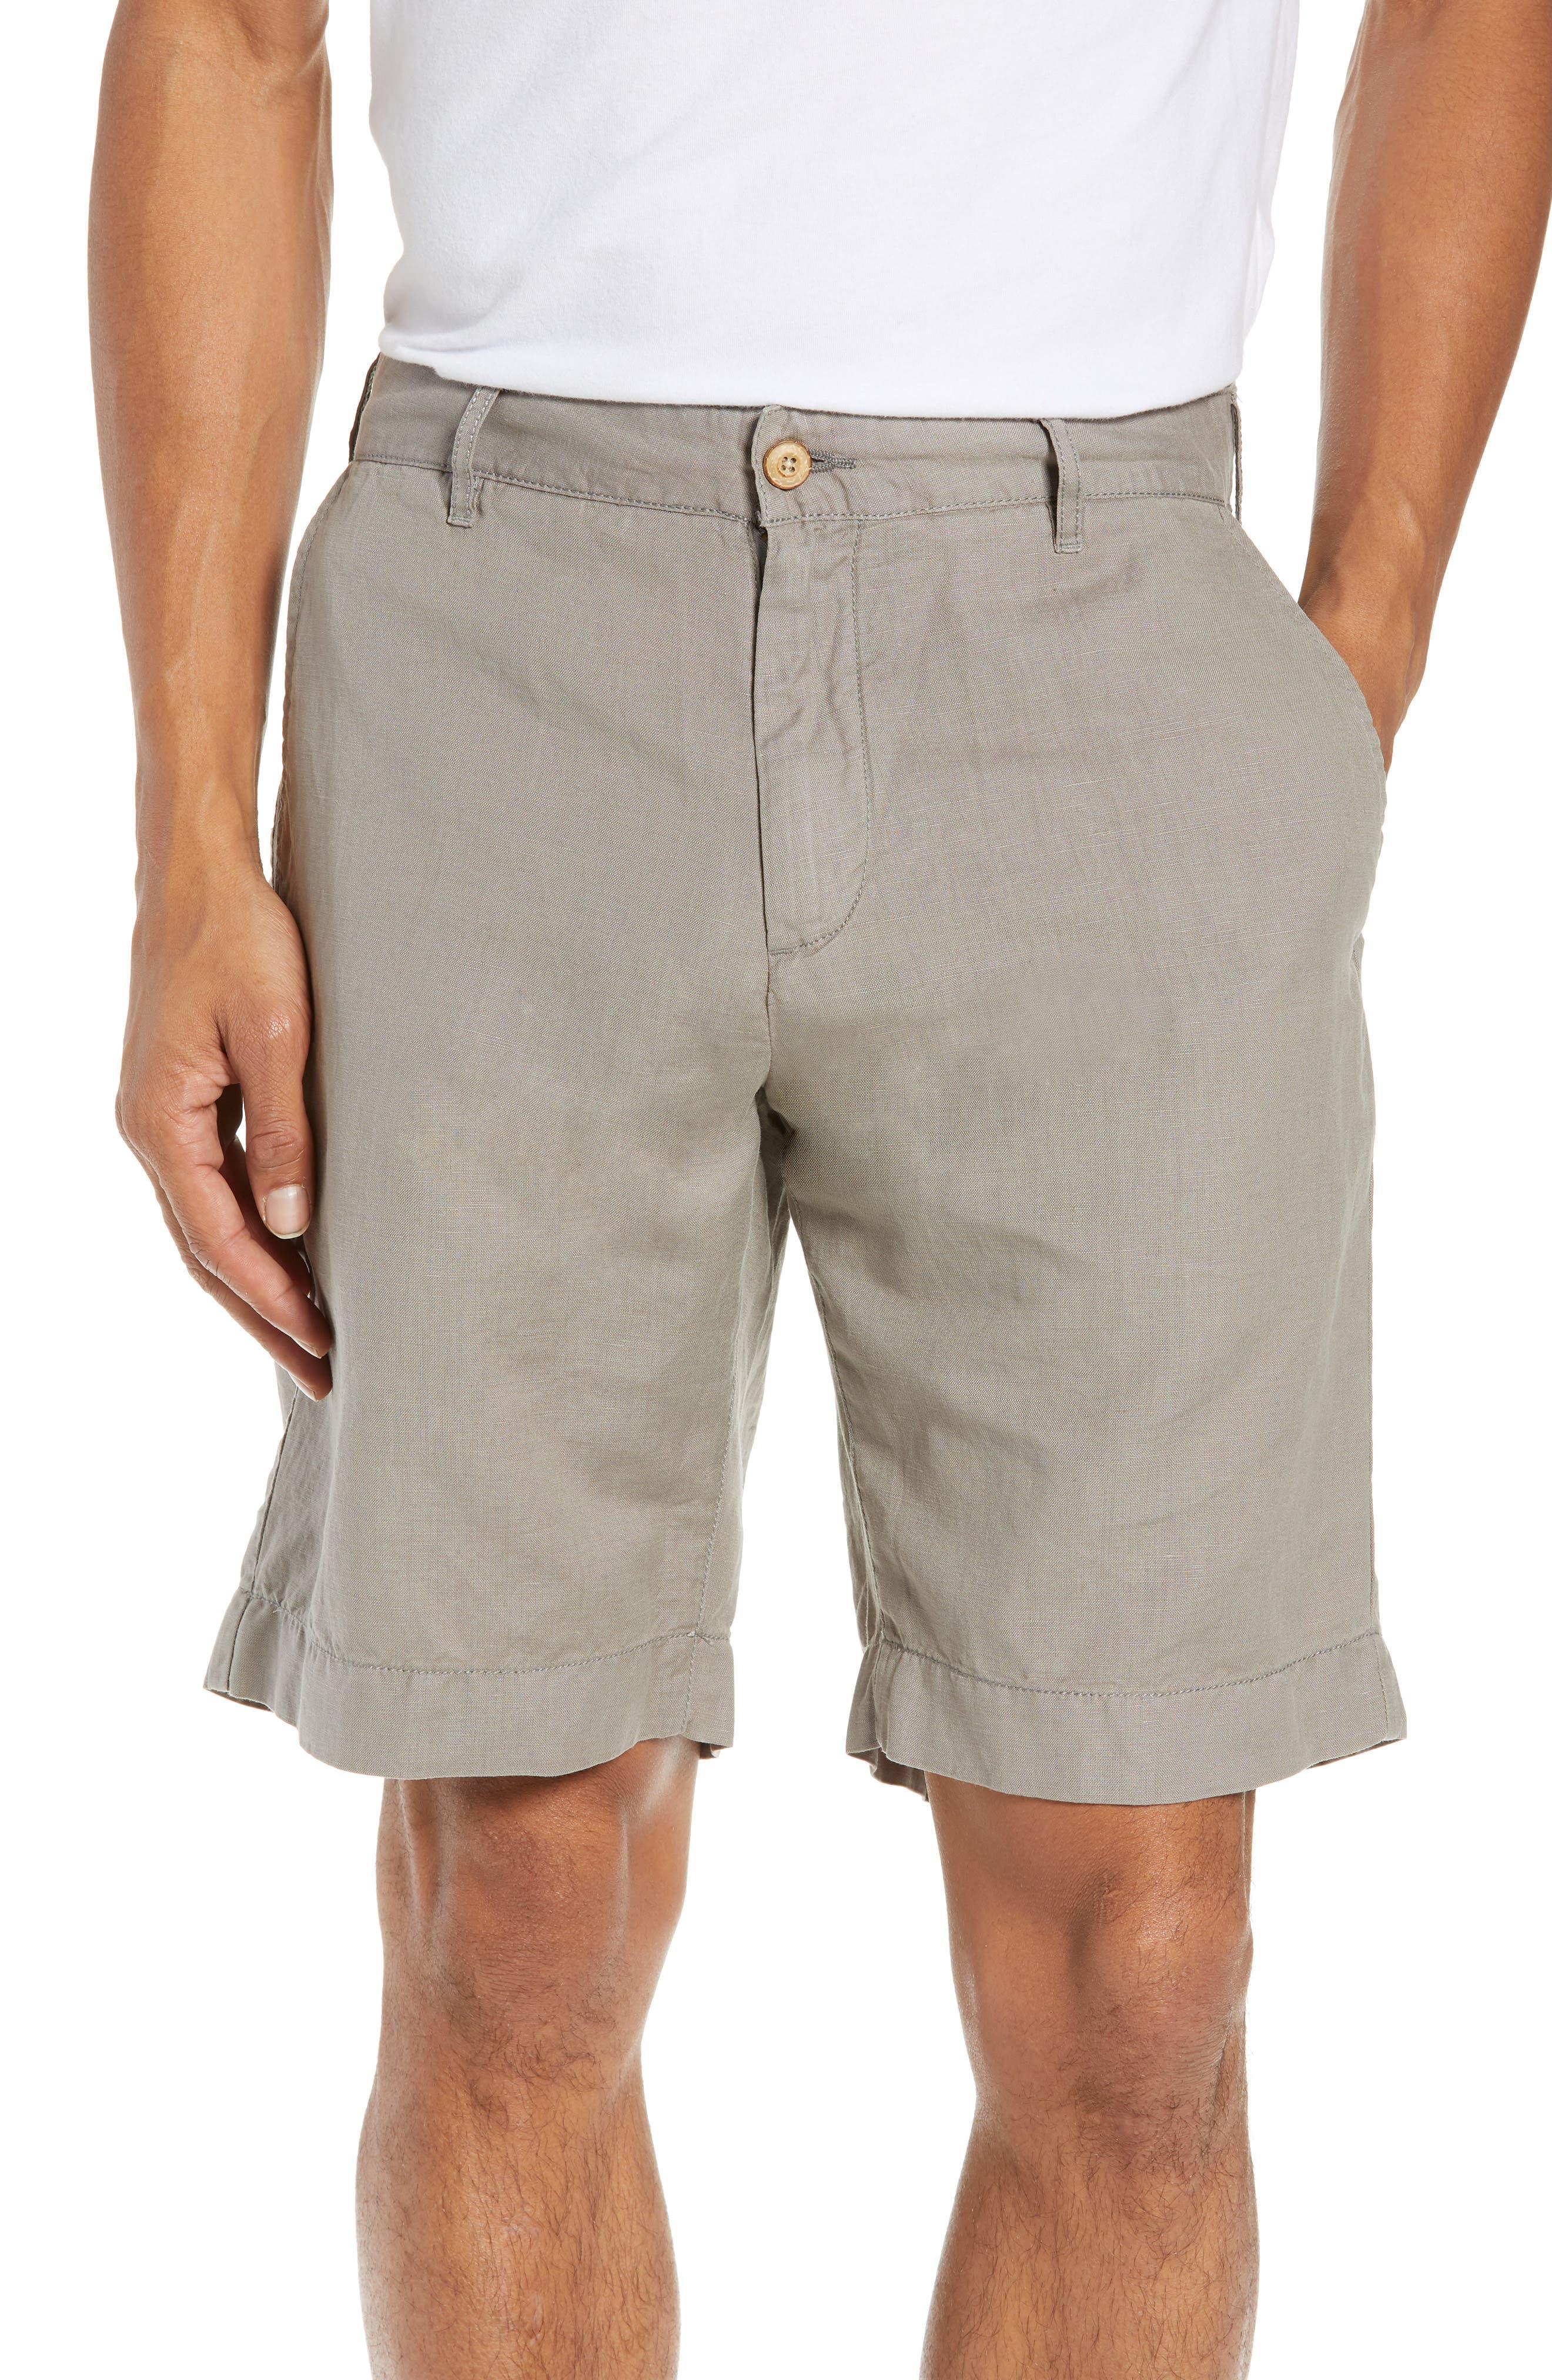 Malibu Shorts,                         Main,                         color, GREY